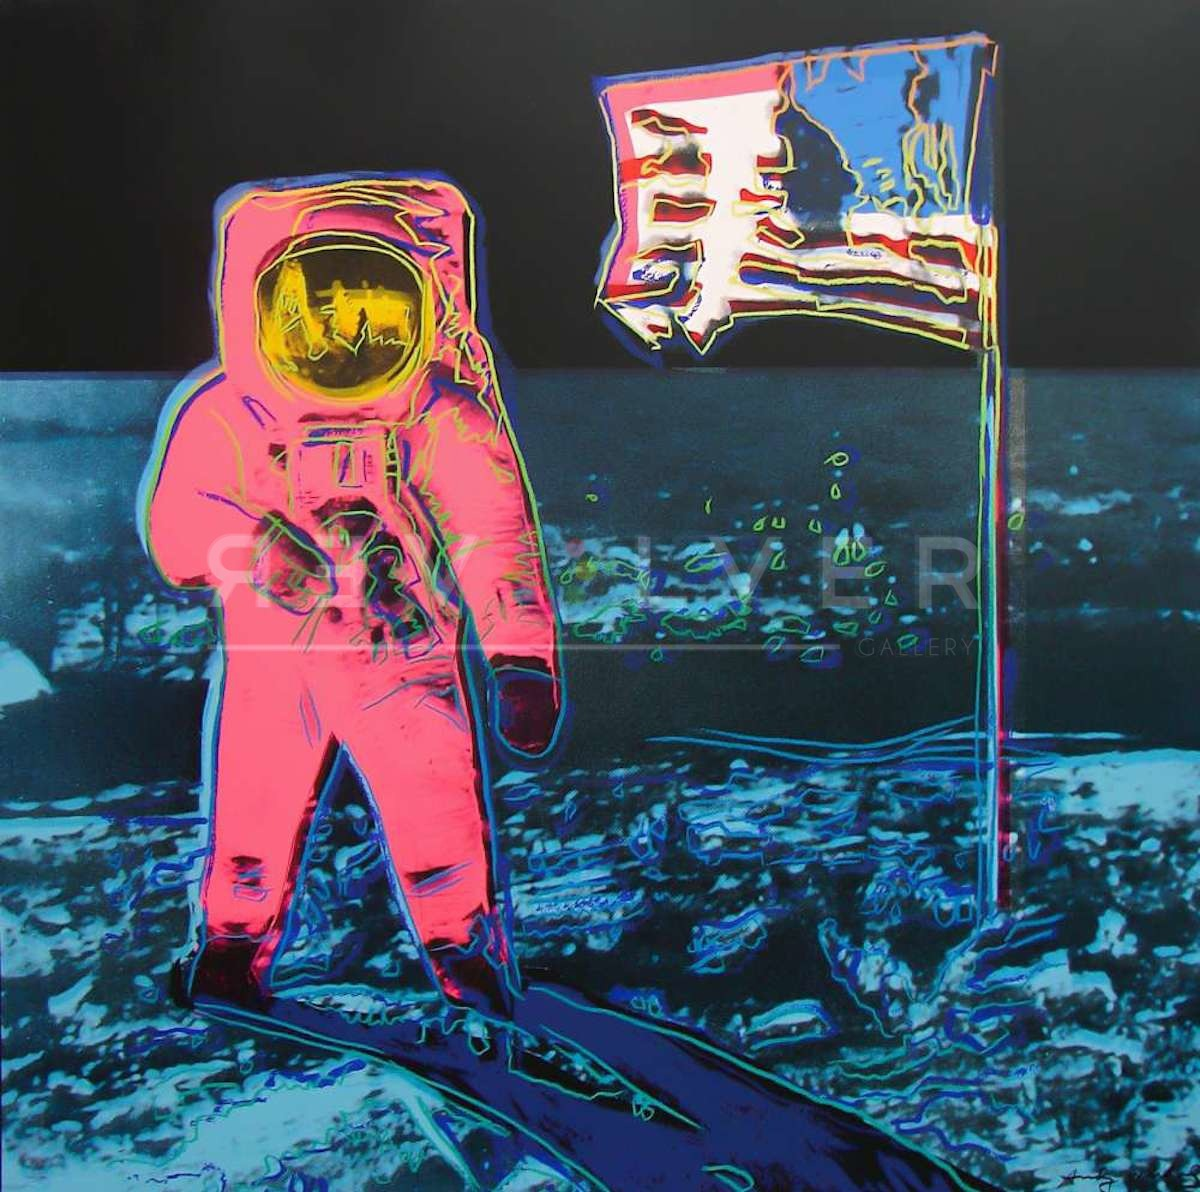 Andy Warhol Moonwalk 405